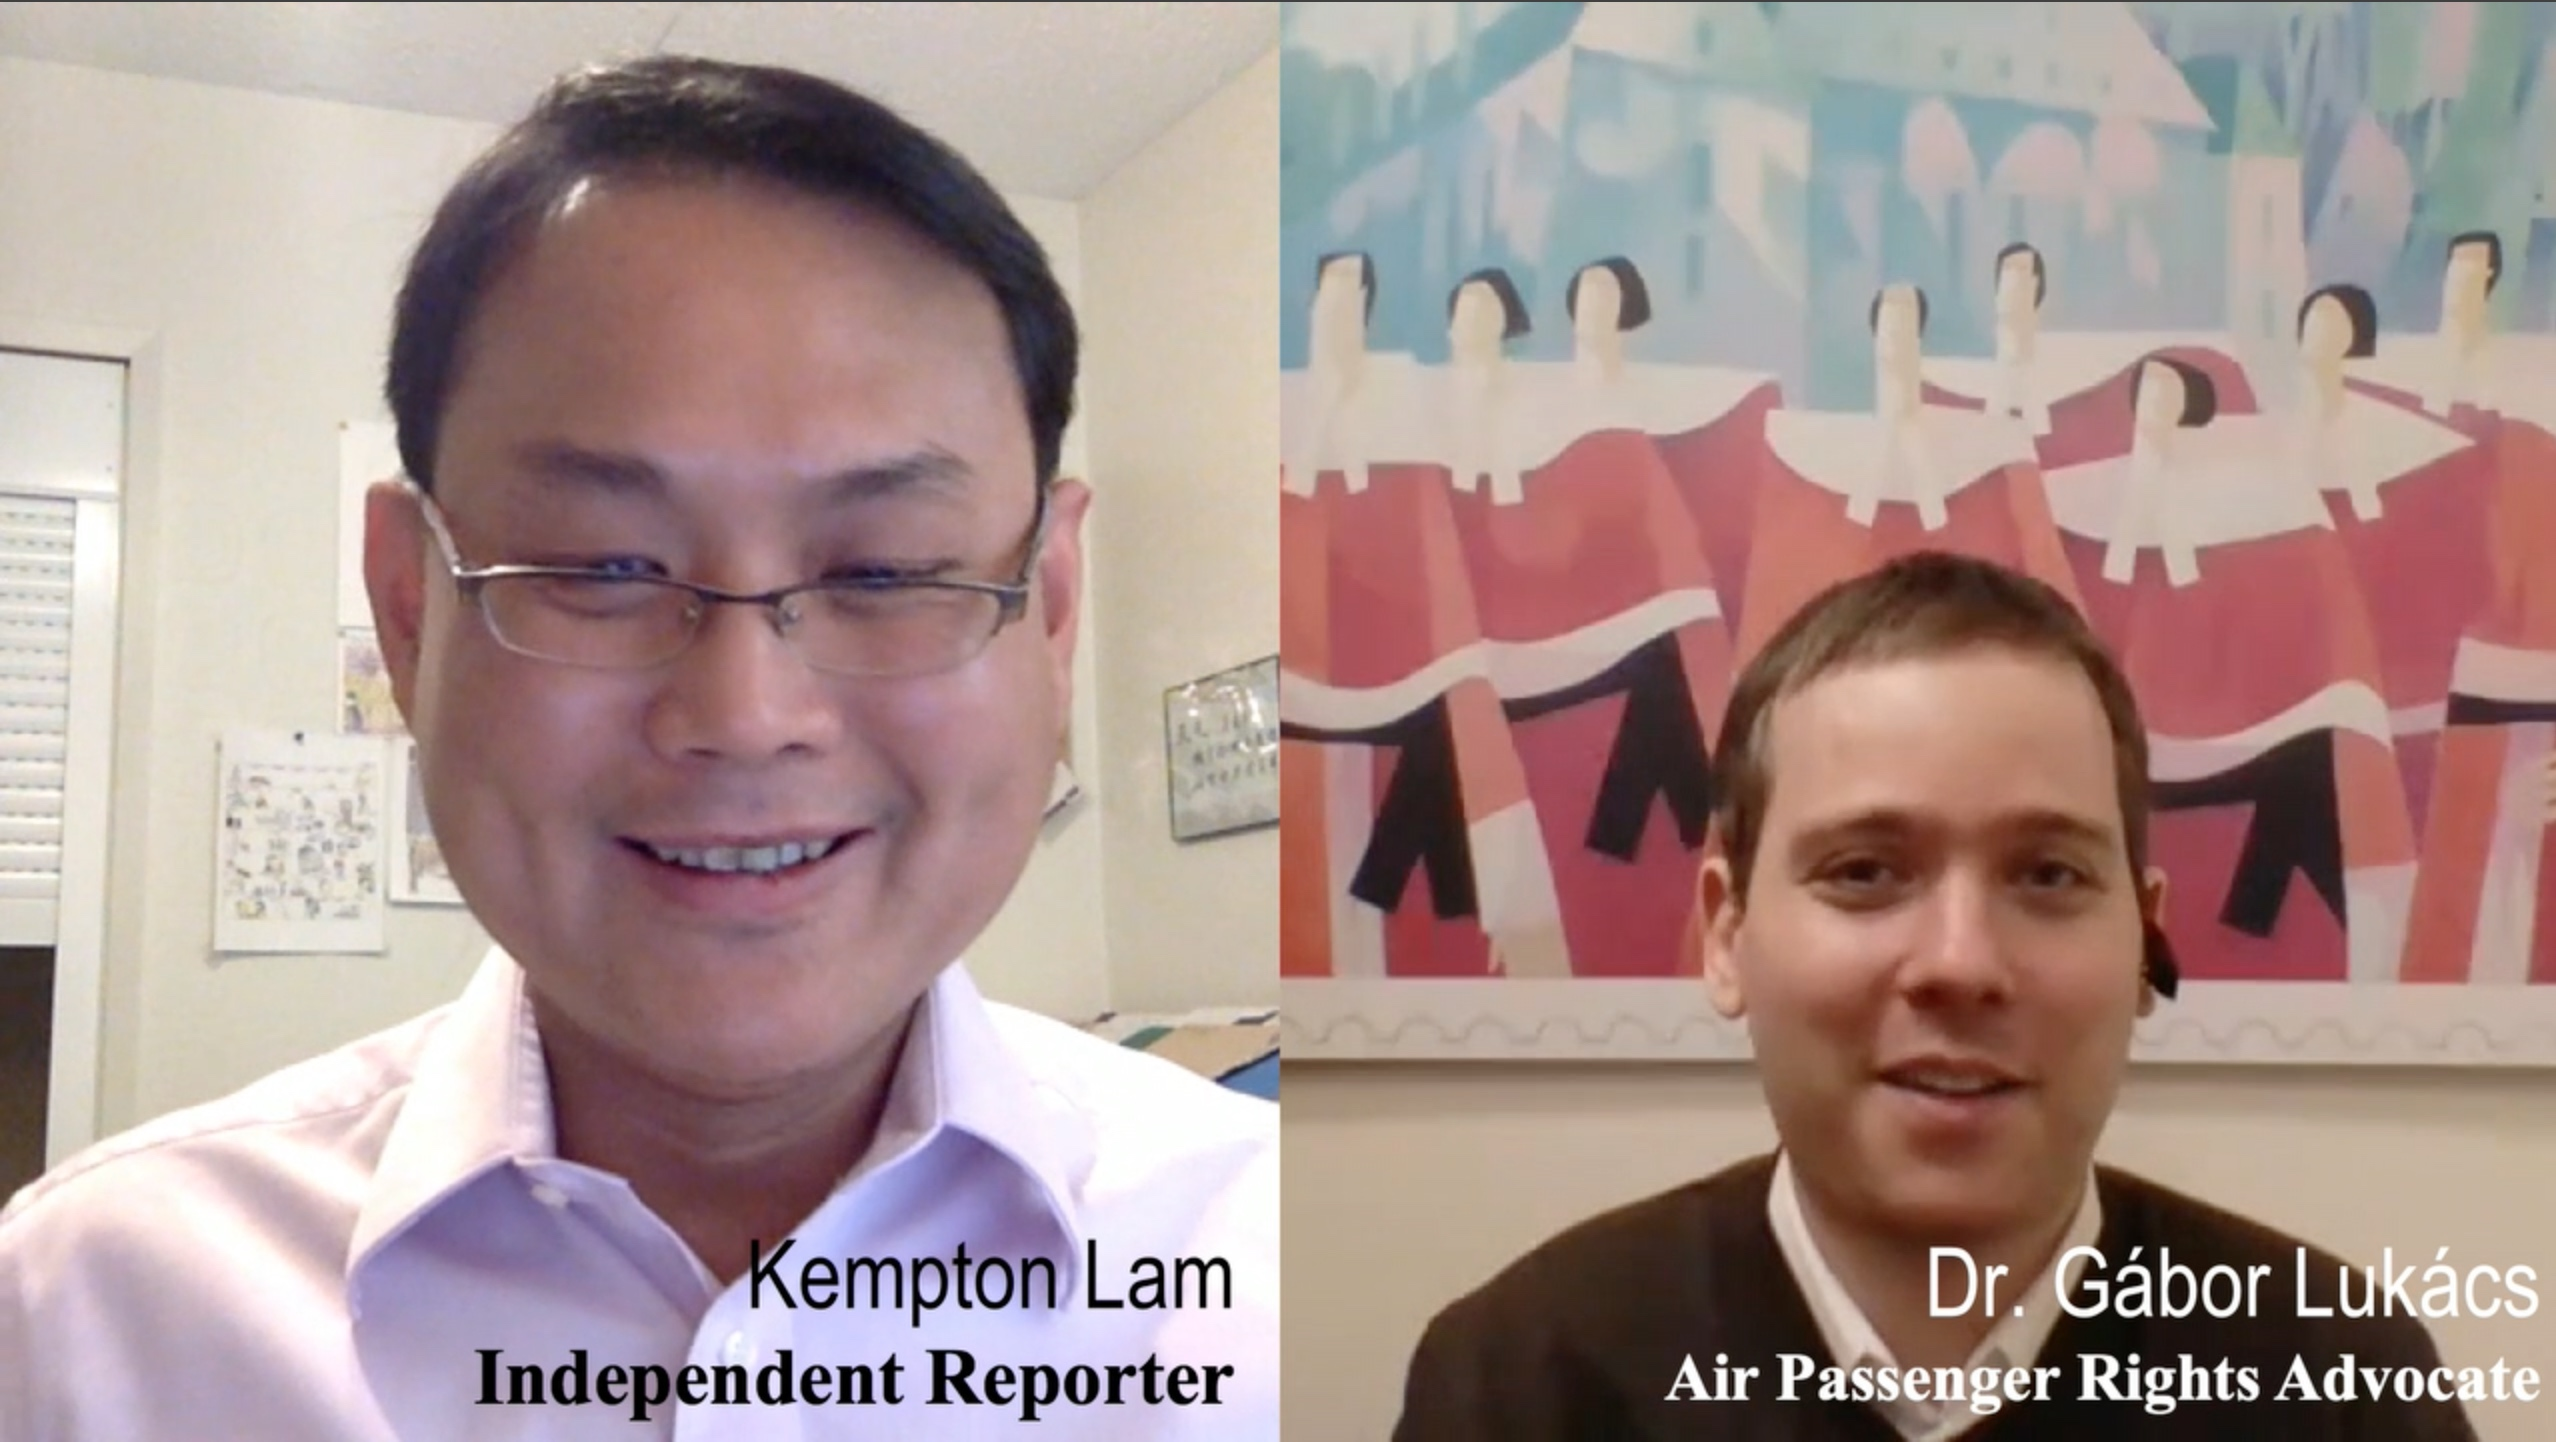 Air Passenger Rights Advocate interview at Supreme Court post Dr. Gábor Lukács' oral arguments - thumbnail